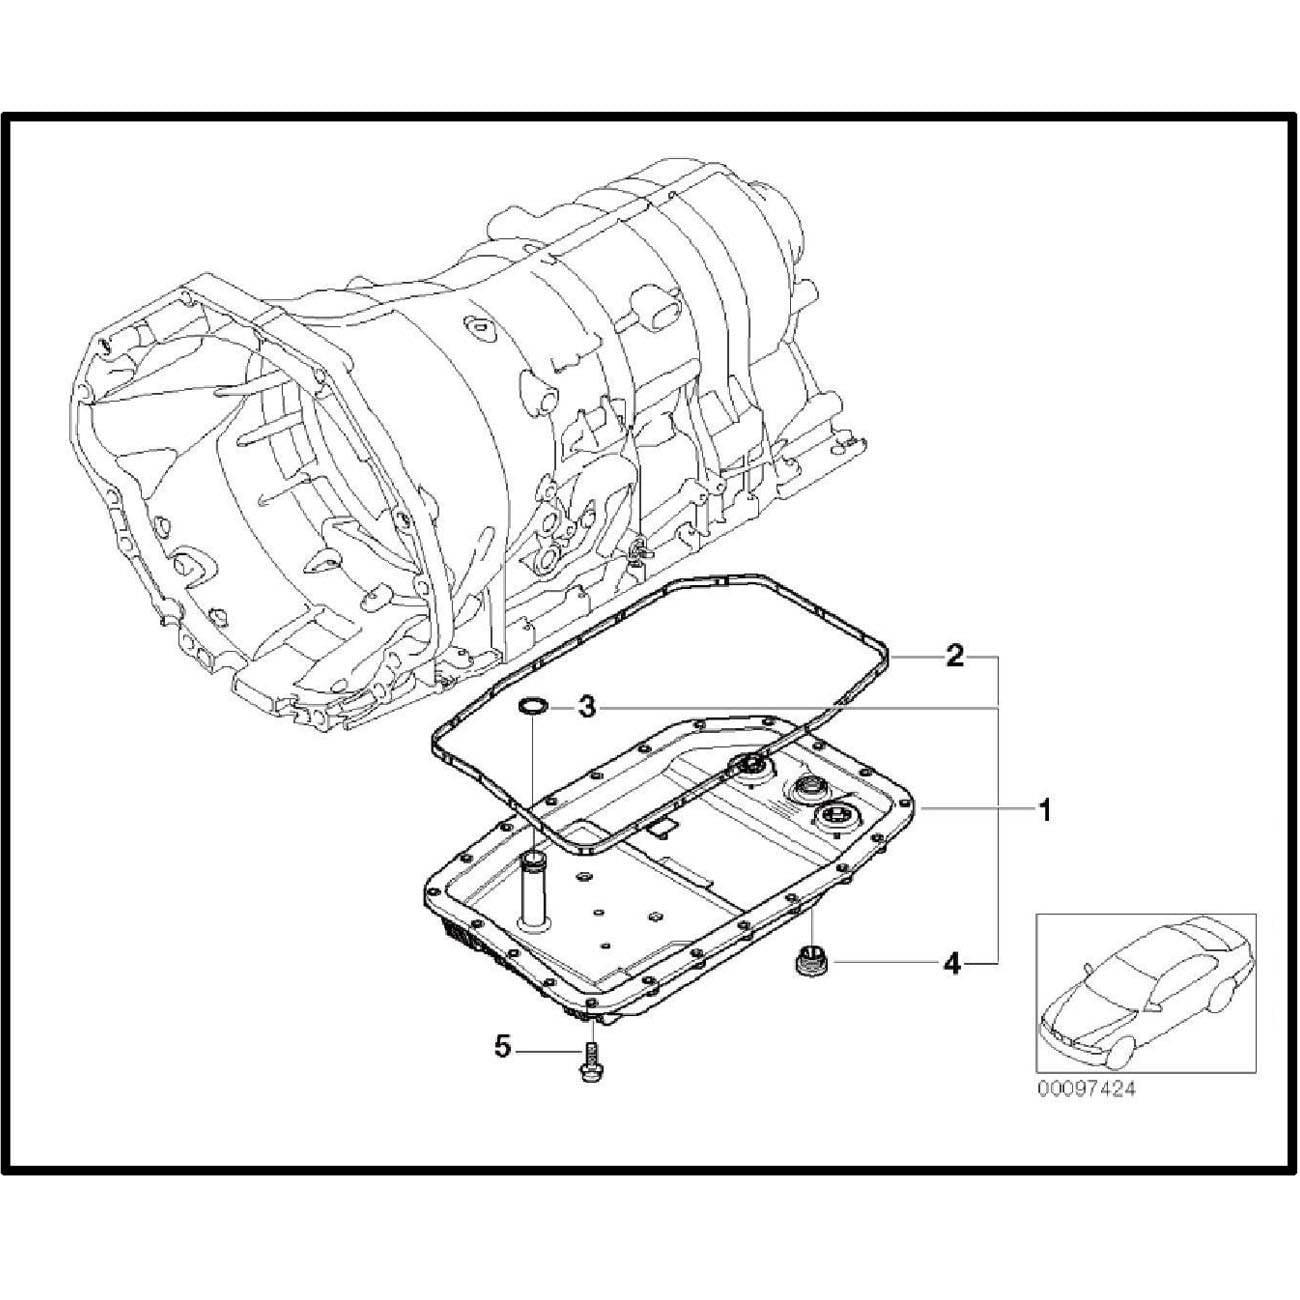 Bapmic 6hp26 Auto Transmission Oil Filter Pan Repair Kit For Bmw